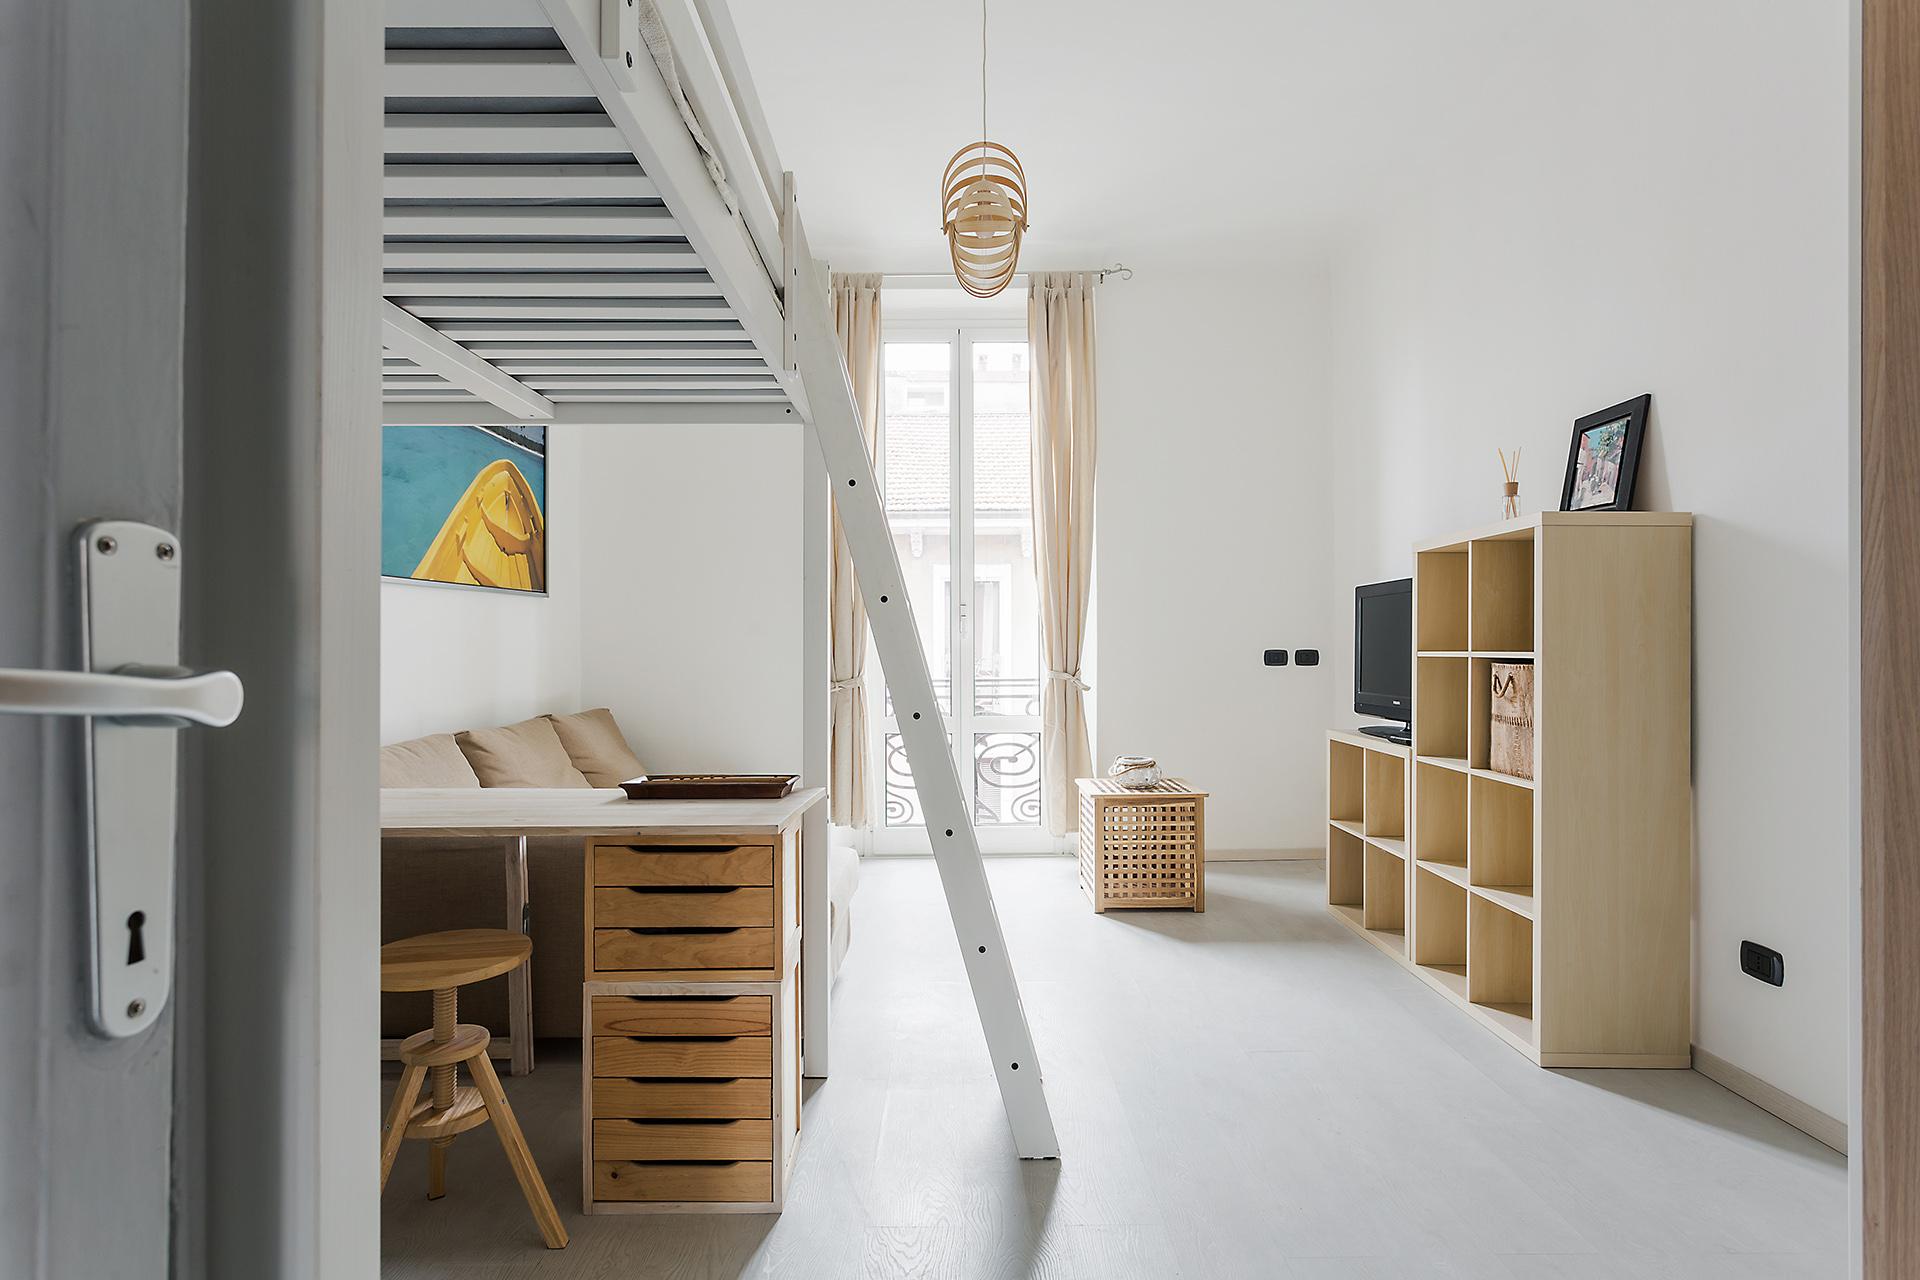 Hostmate - Appartamento